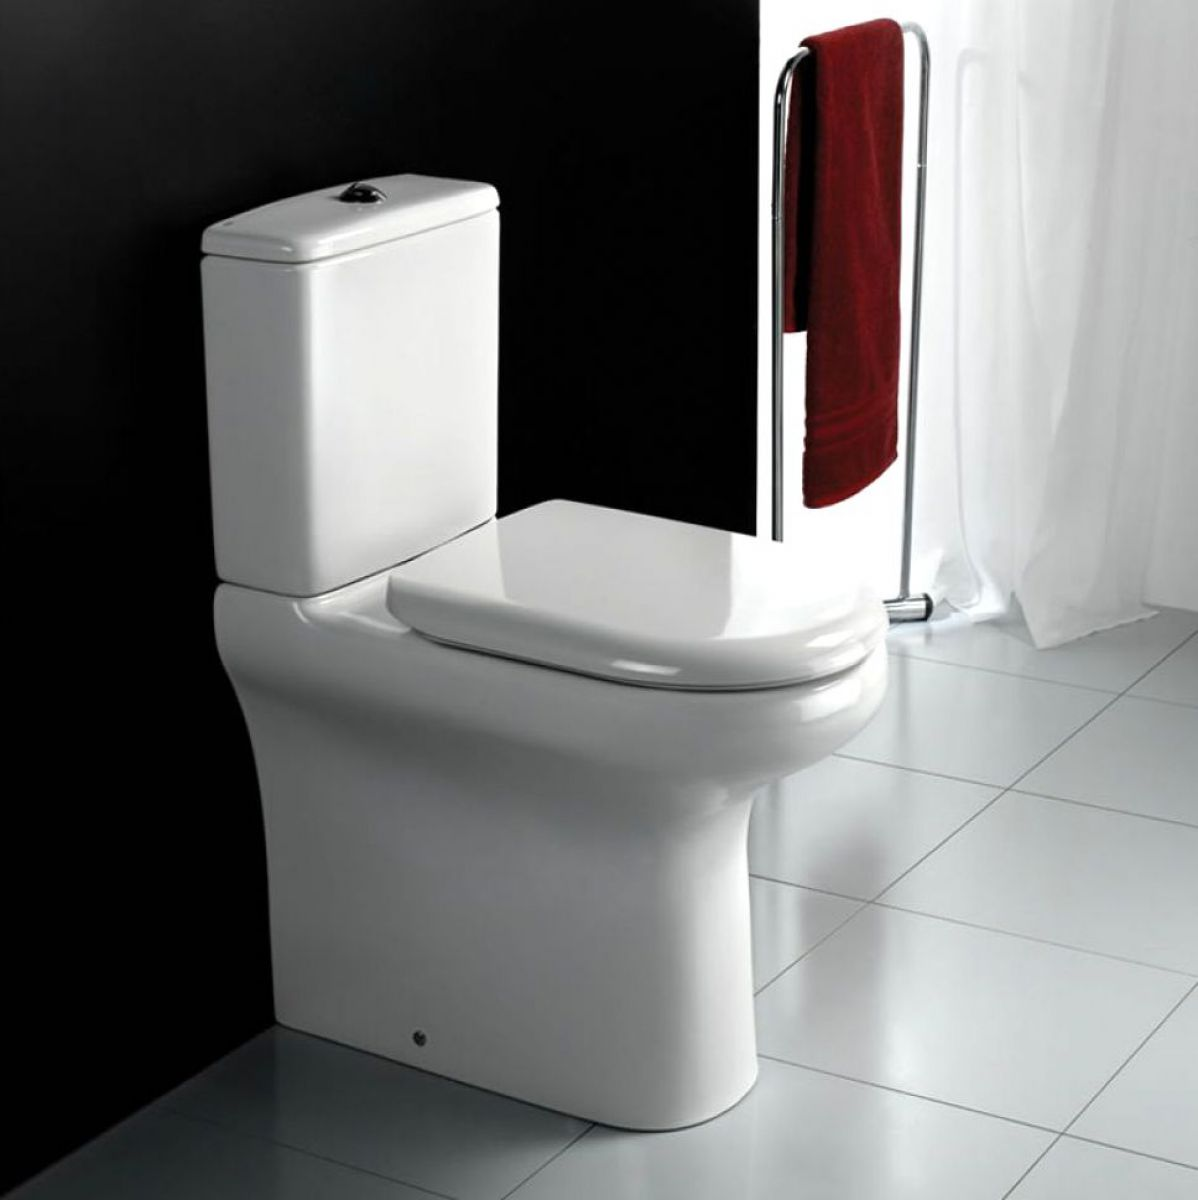 Rak Compact Deluxe Comfort Height Close Coupled Toilet